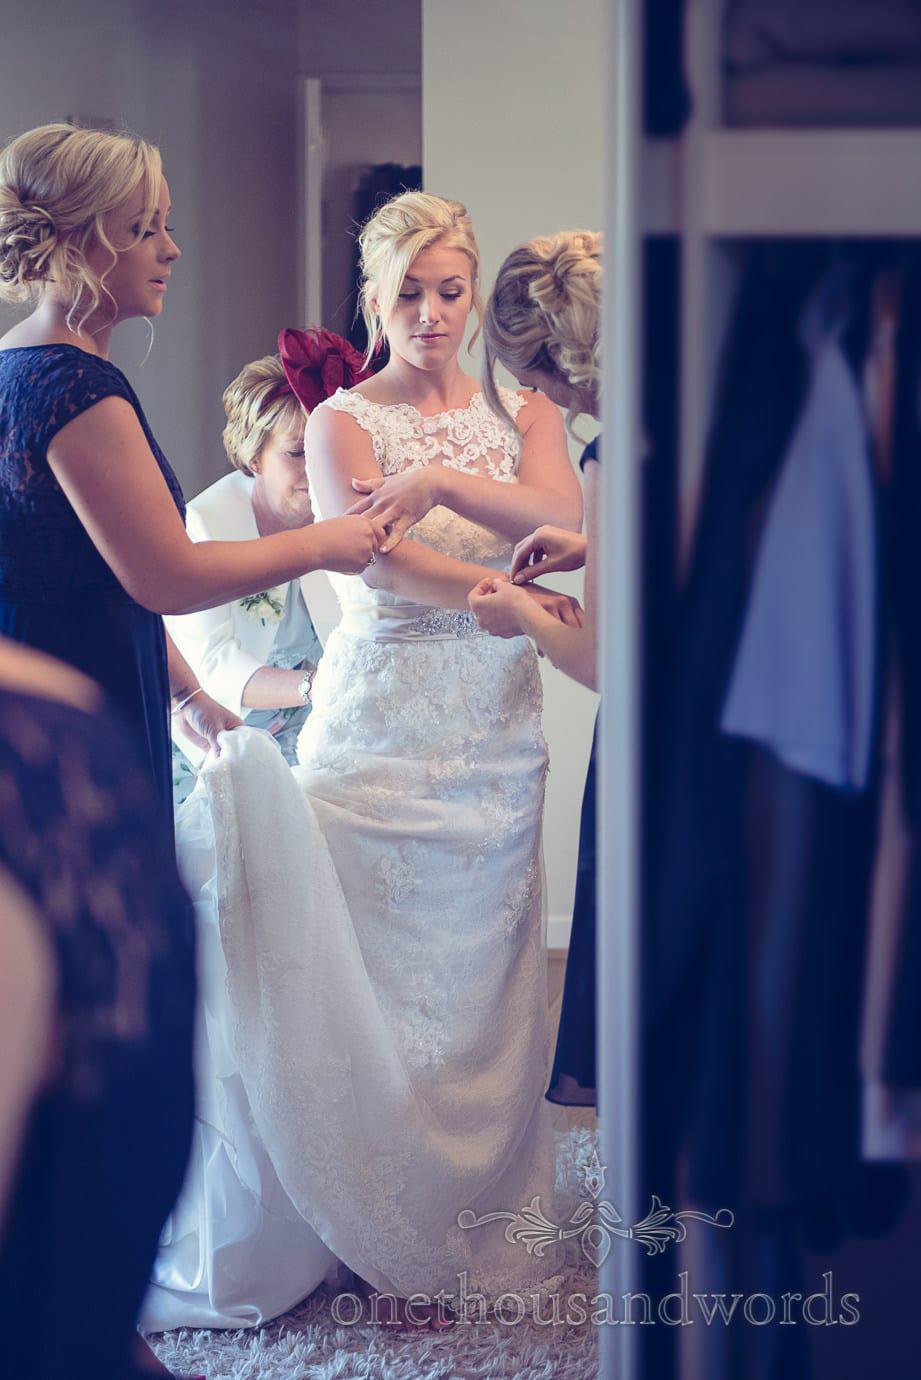 Bride is helped into wedding dress and wedding jewlrey